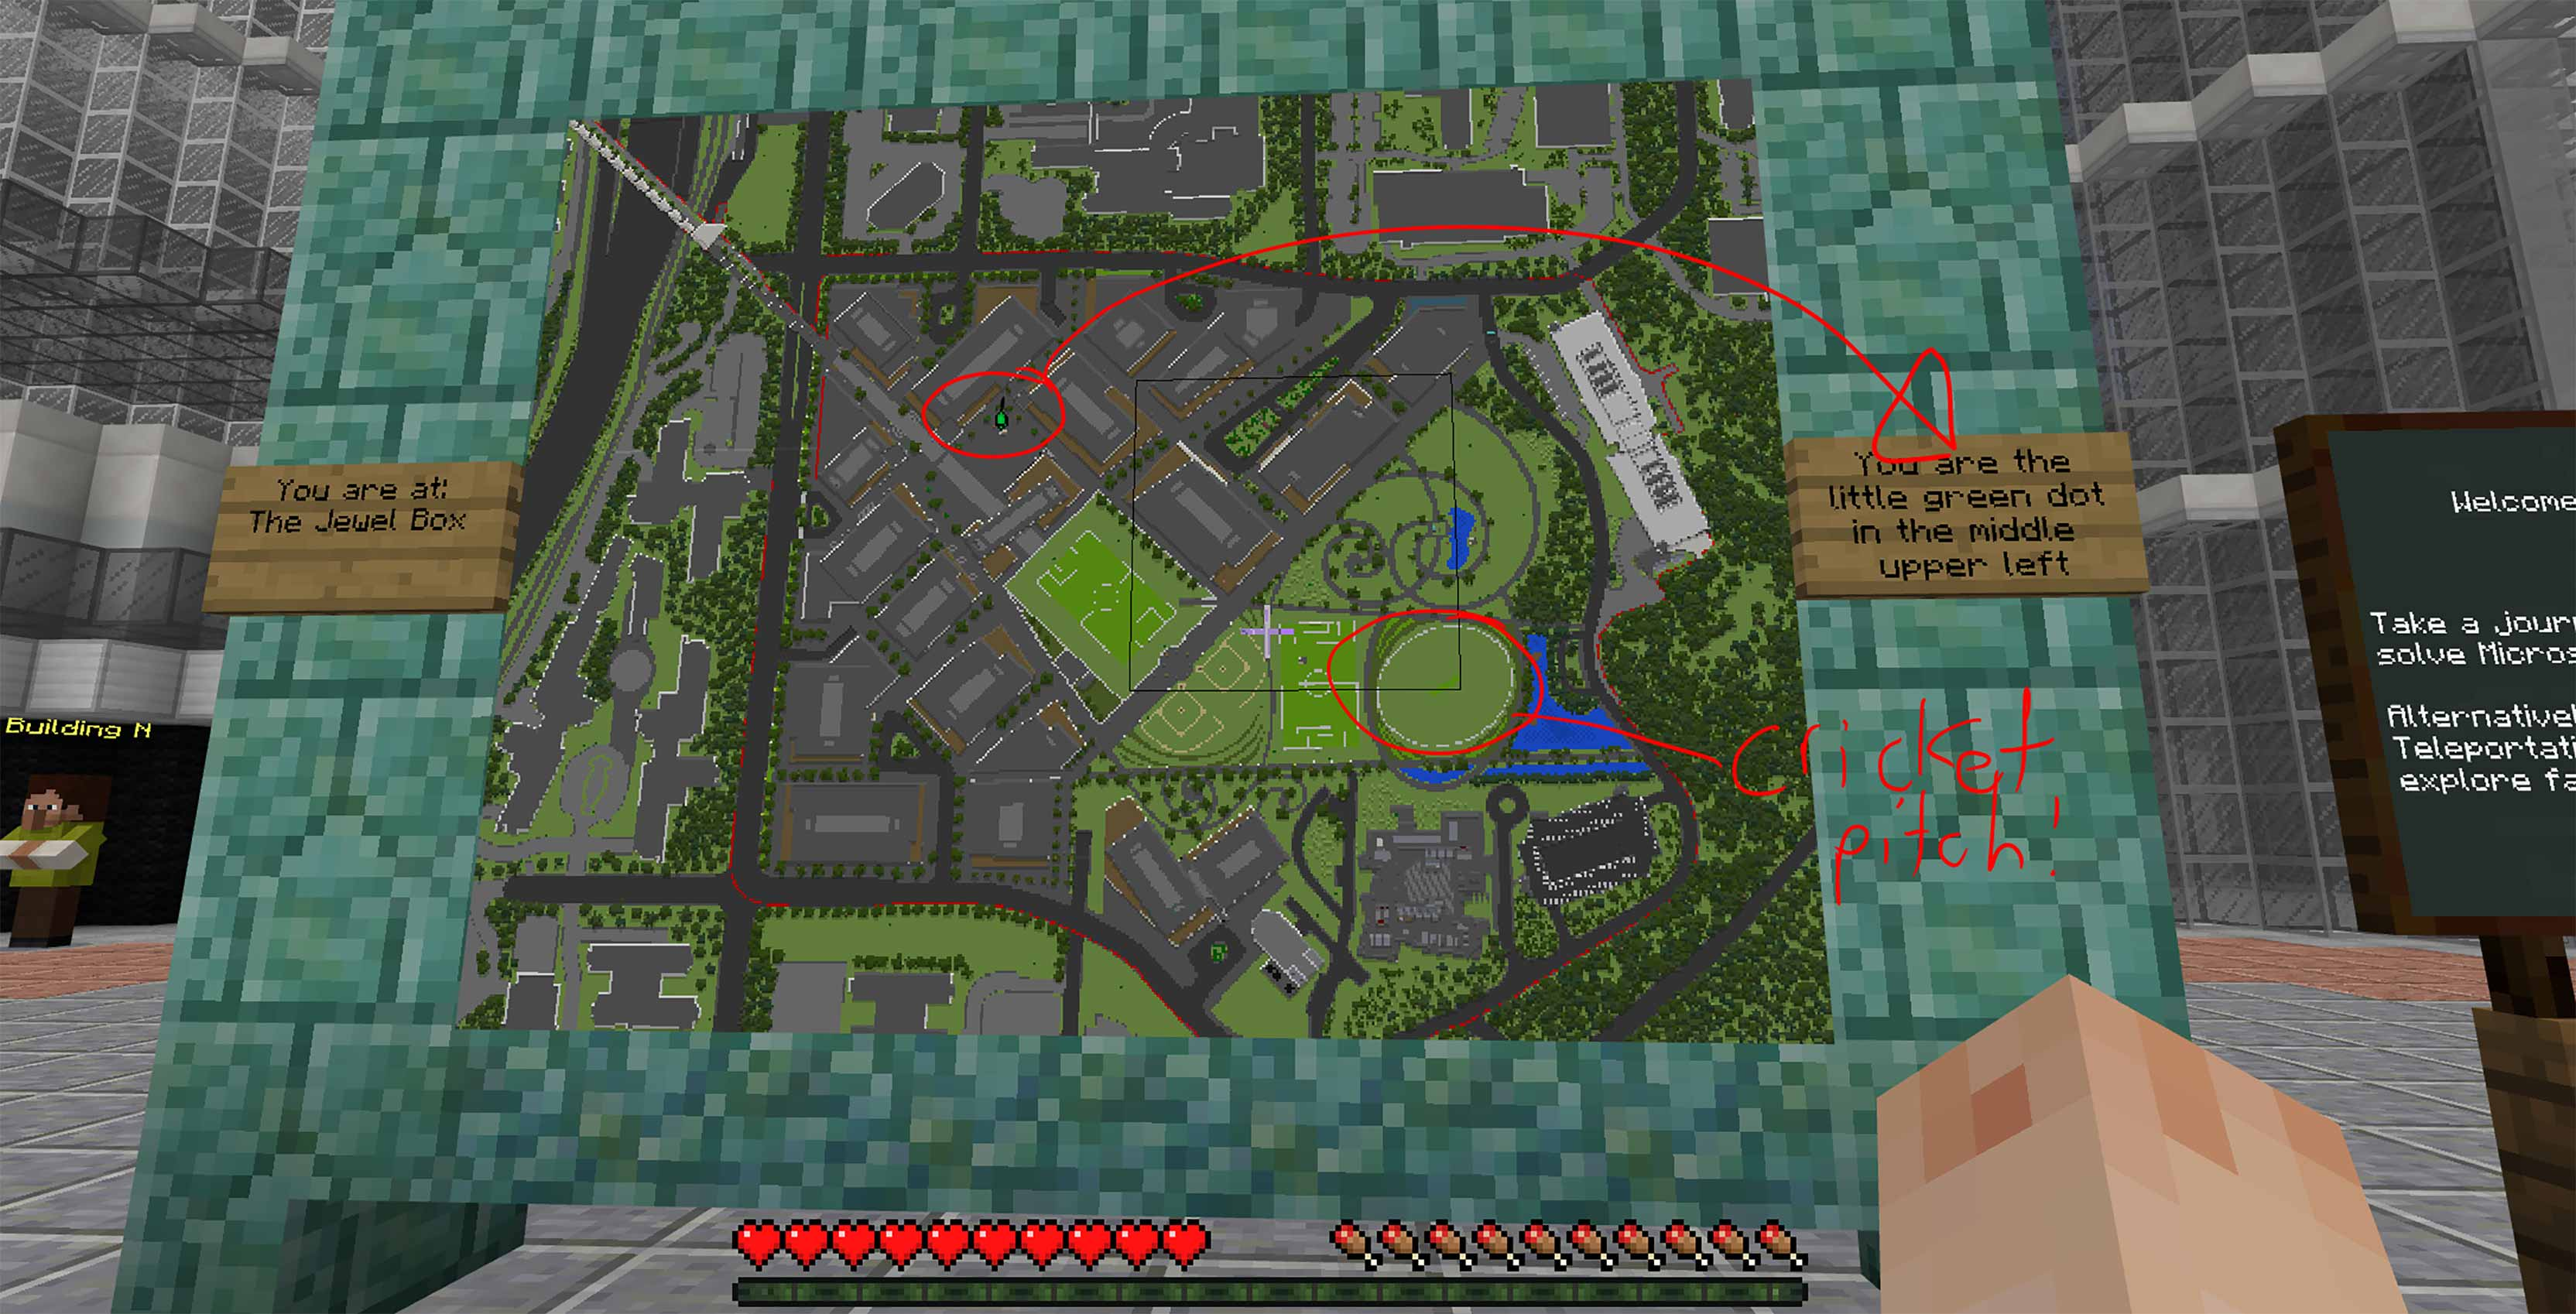 Minecraft HQ campus